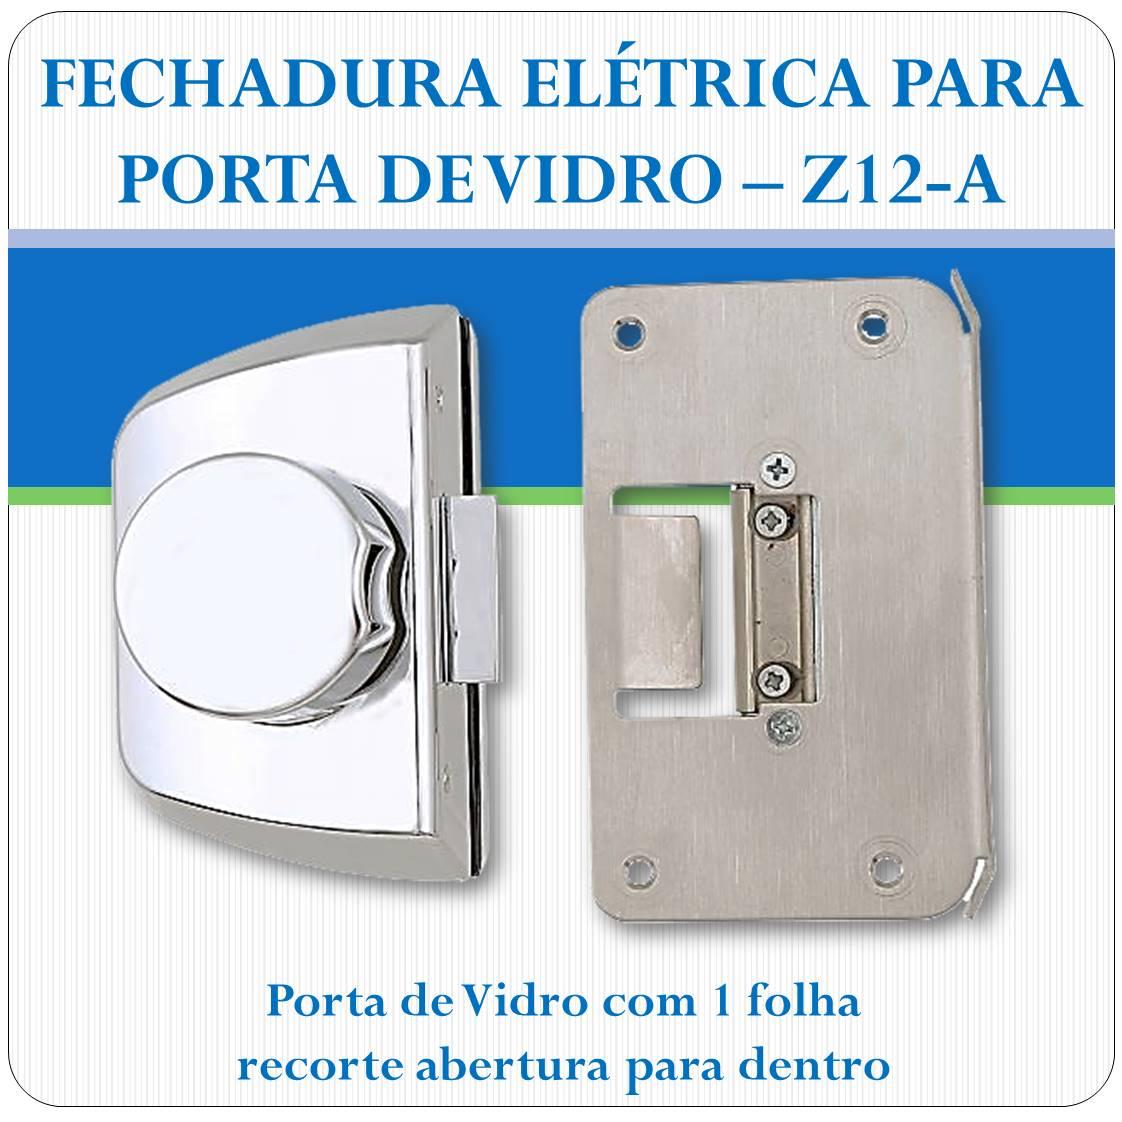 Fechadura Eletrica Porta de Vidro - Z-12A